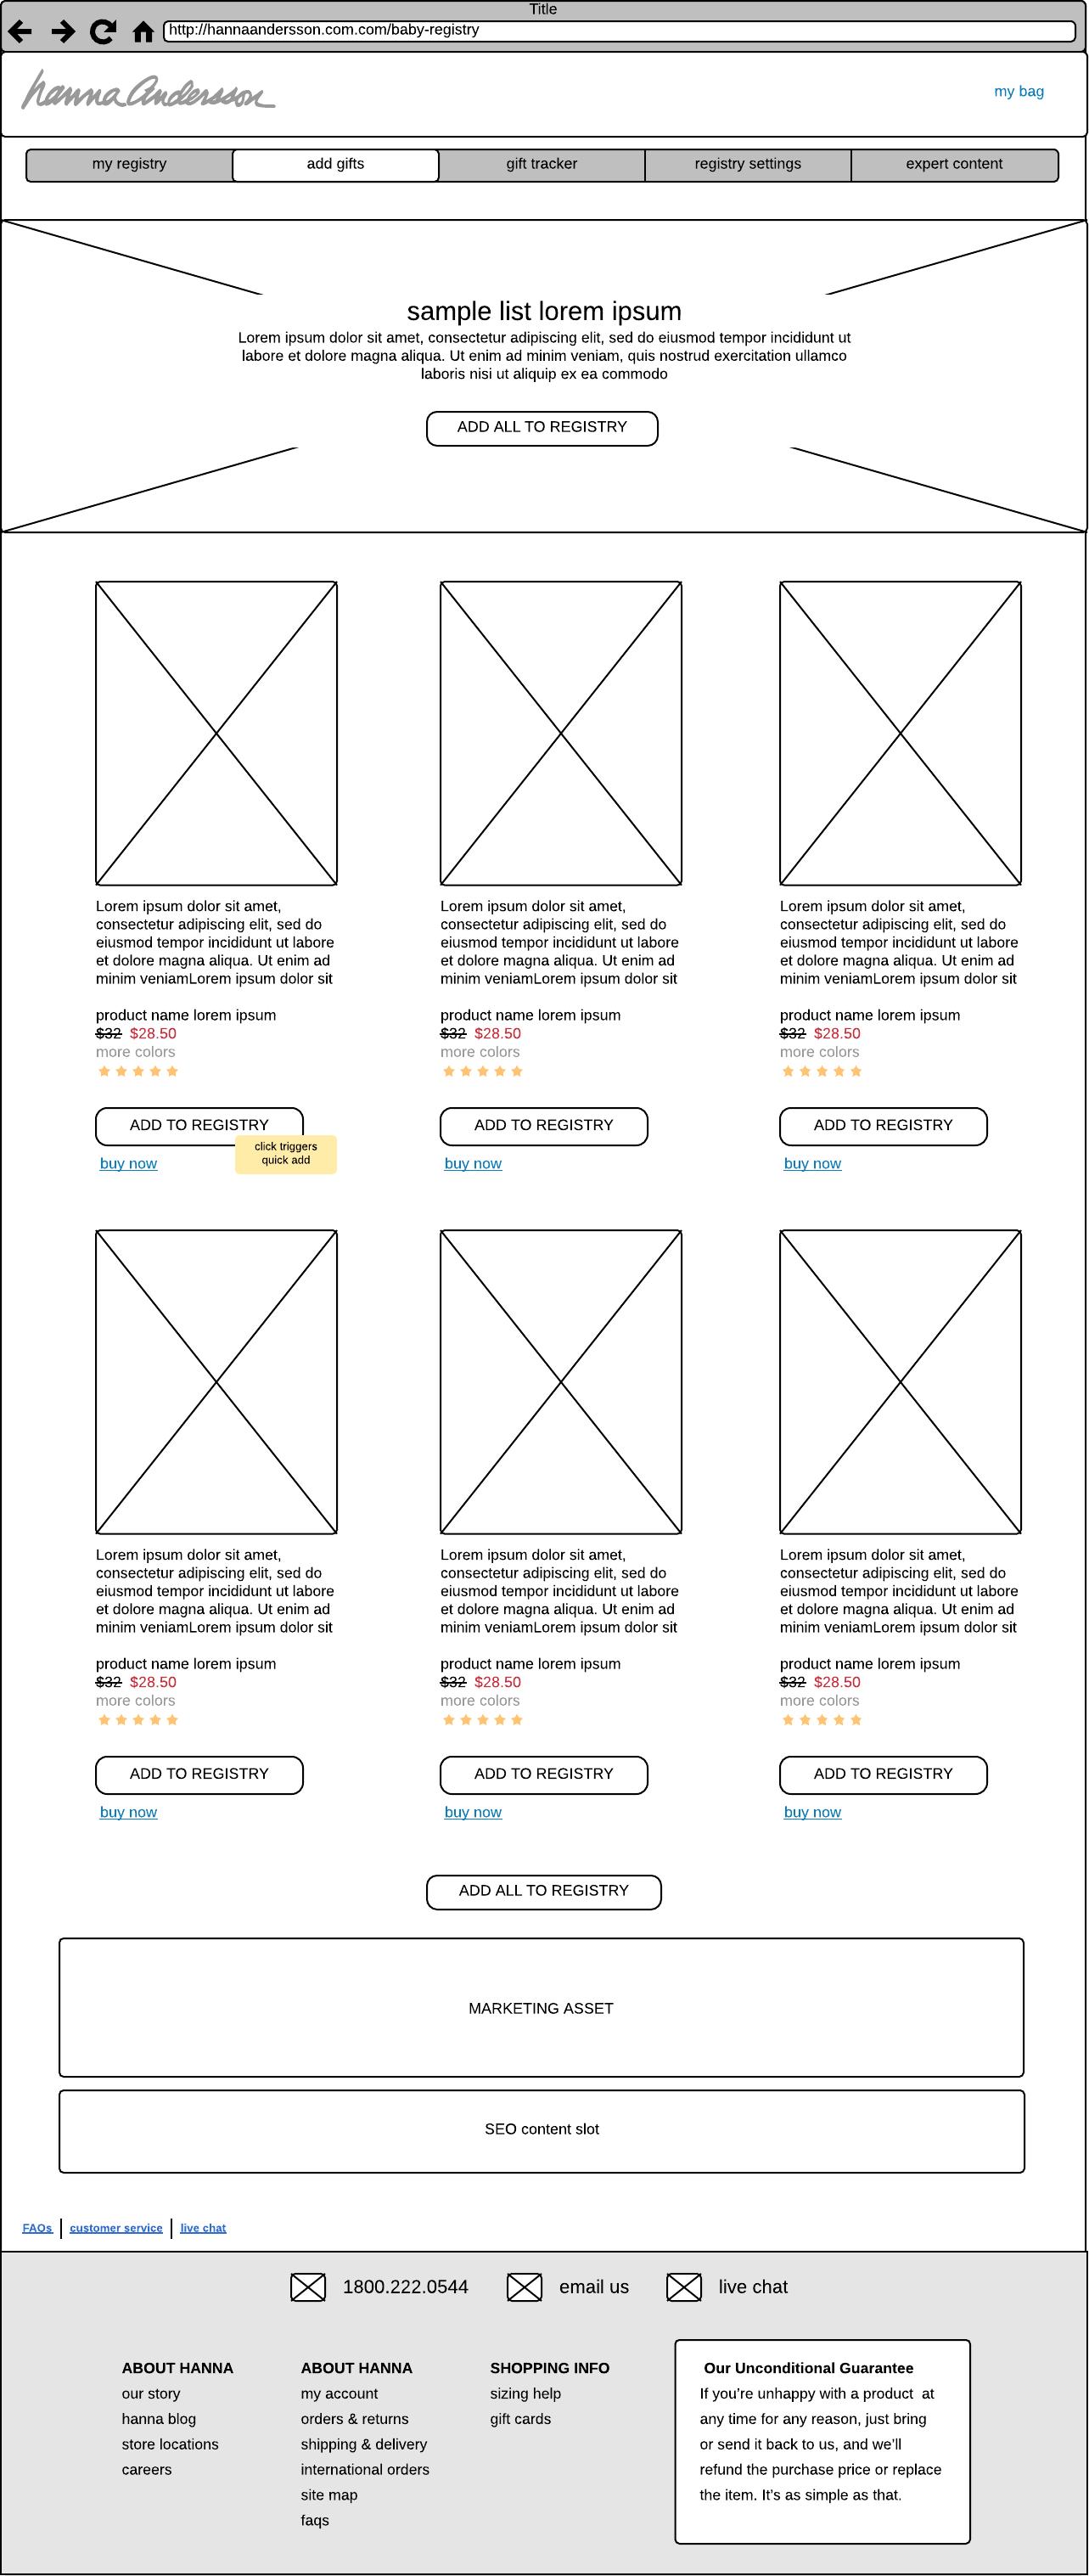 Sample Registry Page